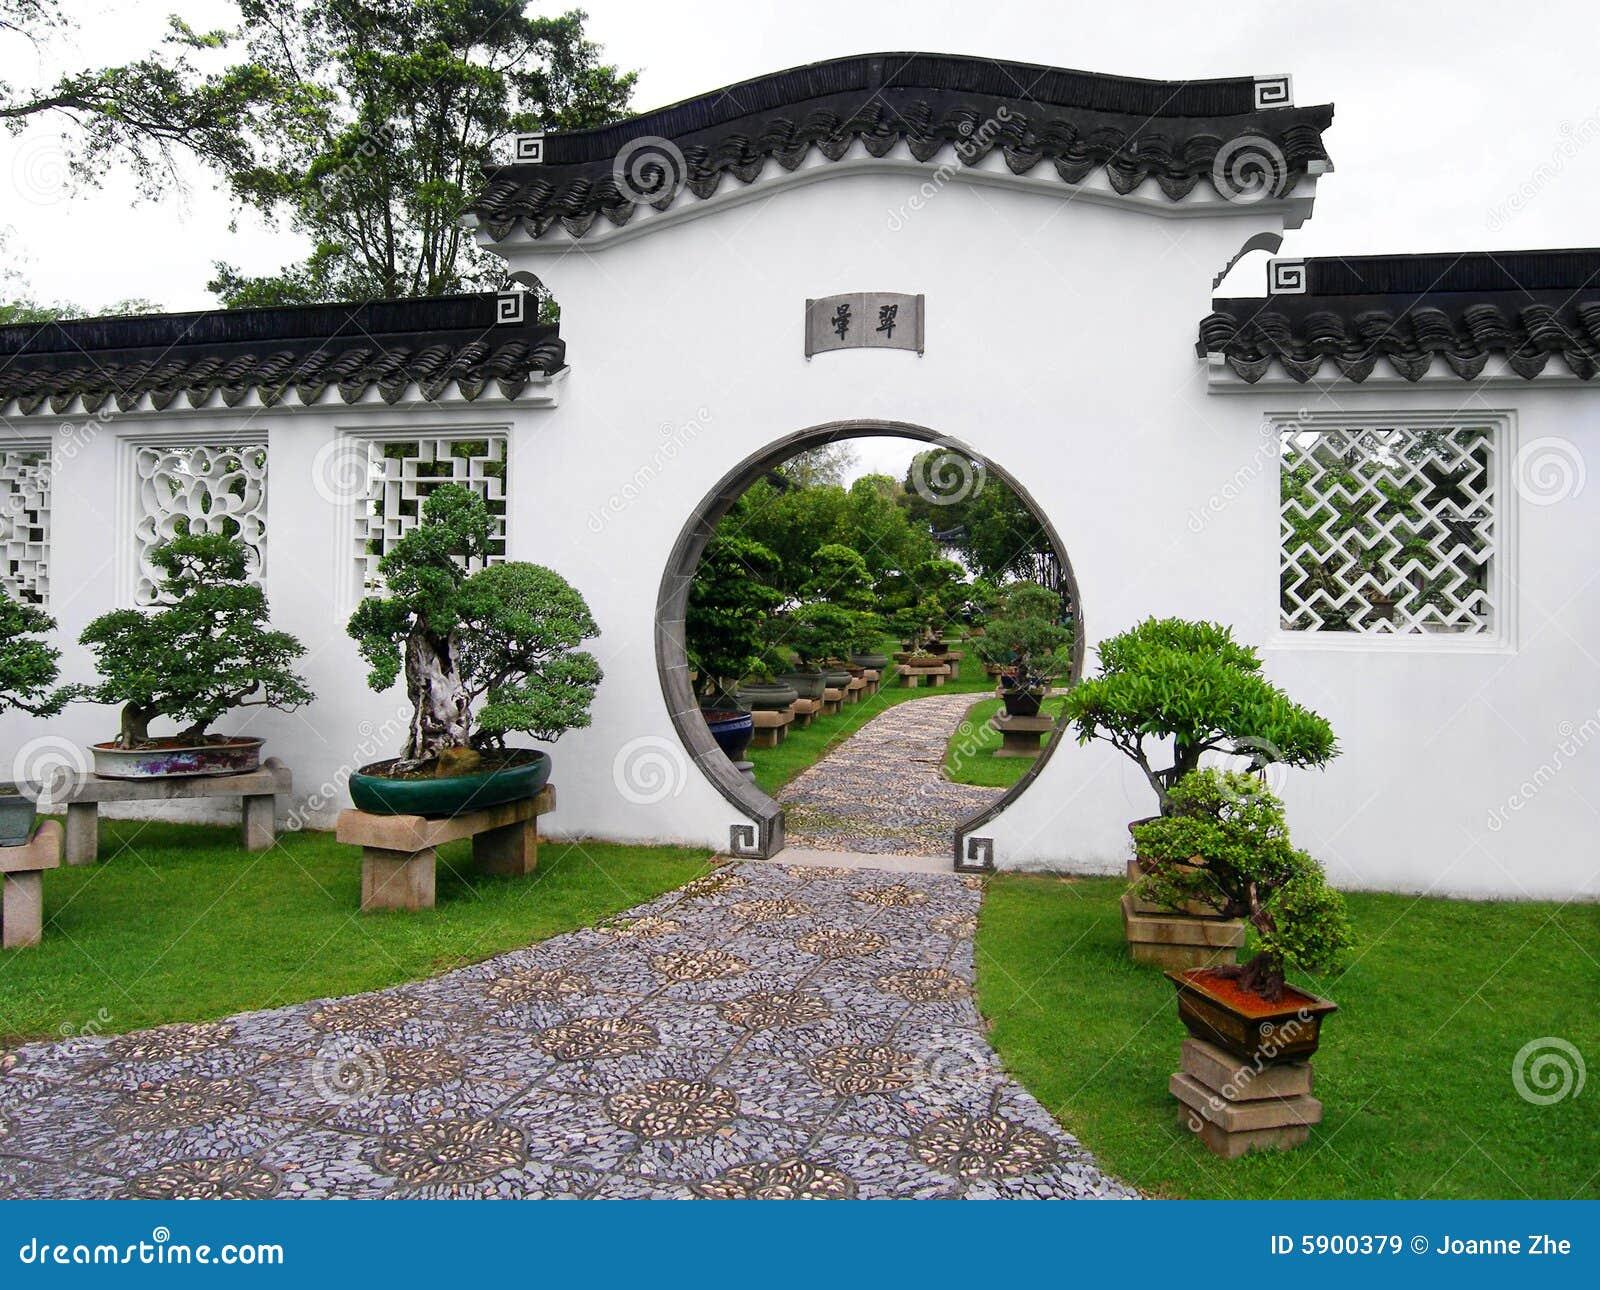 Chinese garden landscaping